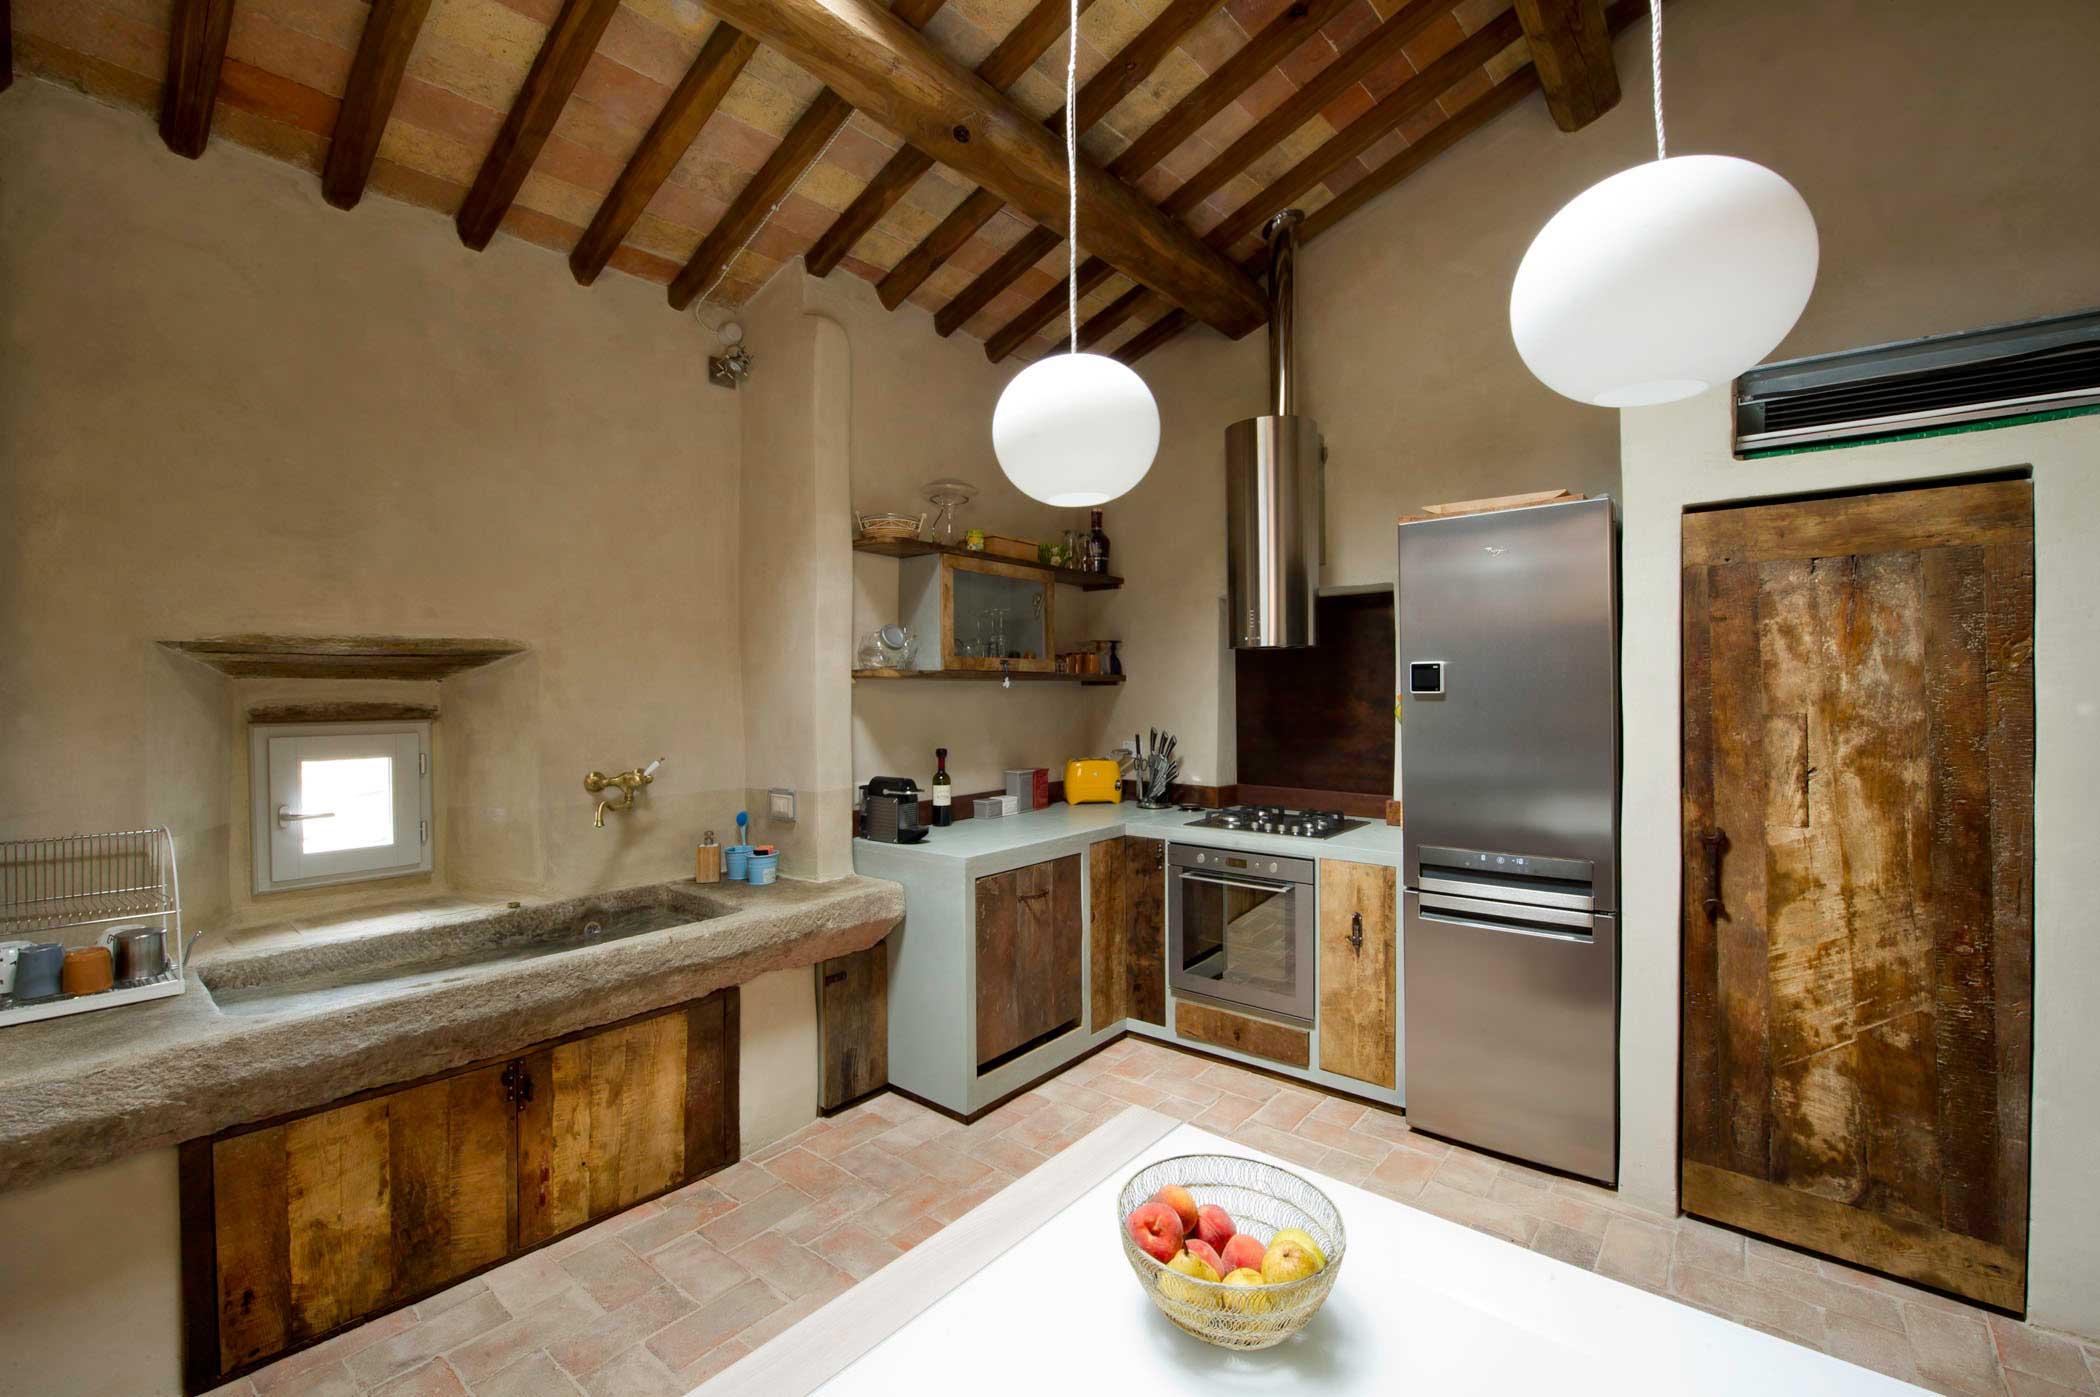 Cucina Selly Quercia Bianca Misura Cucina Moderna Cucine Moderne